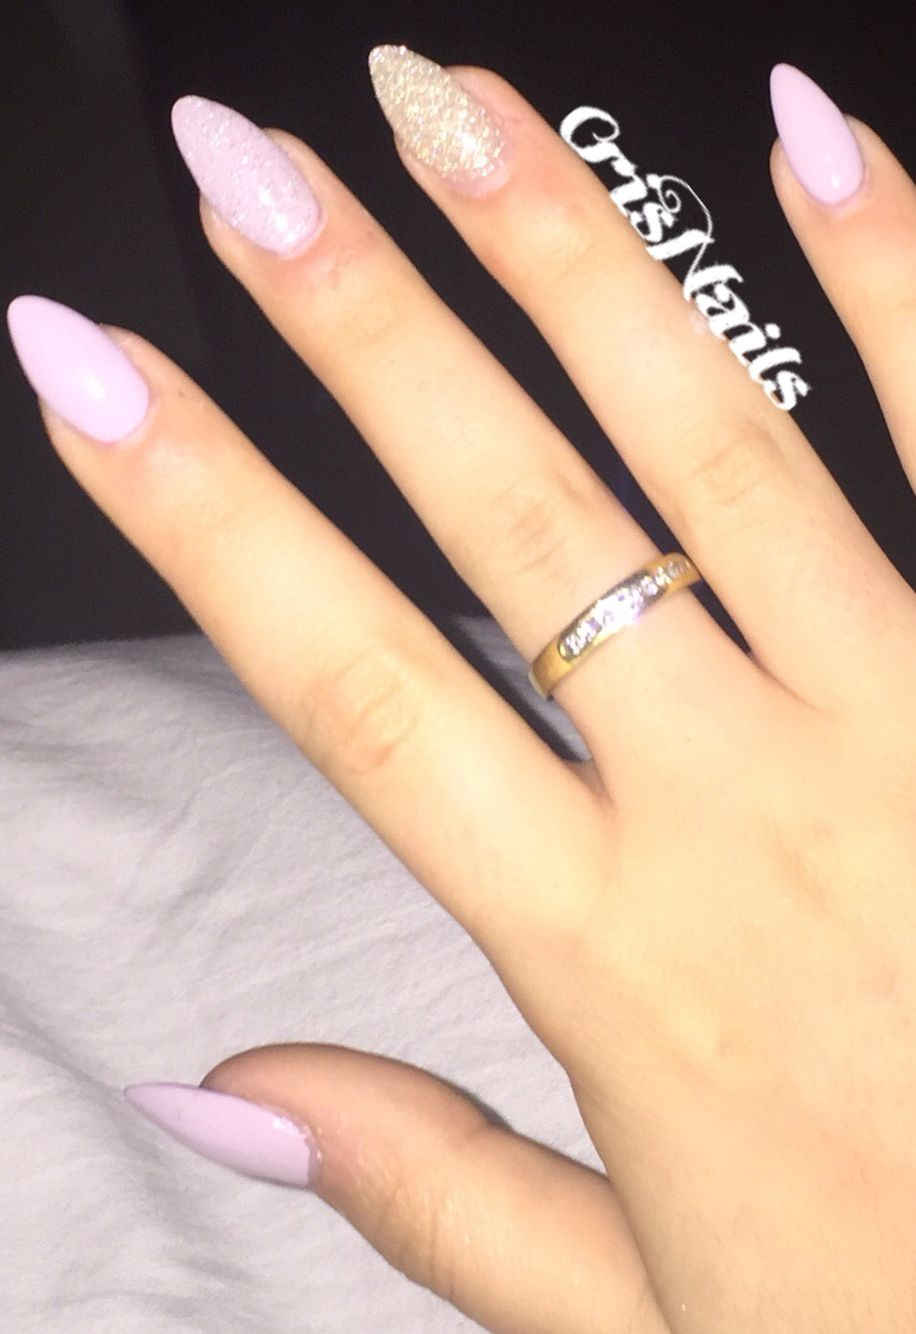 nail nails unghie unghiegel gel ricostruzione lilla viola